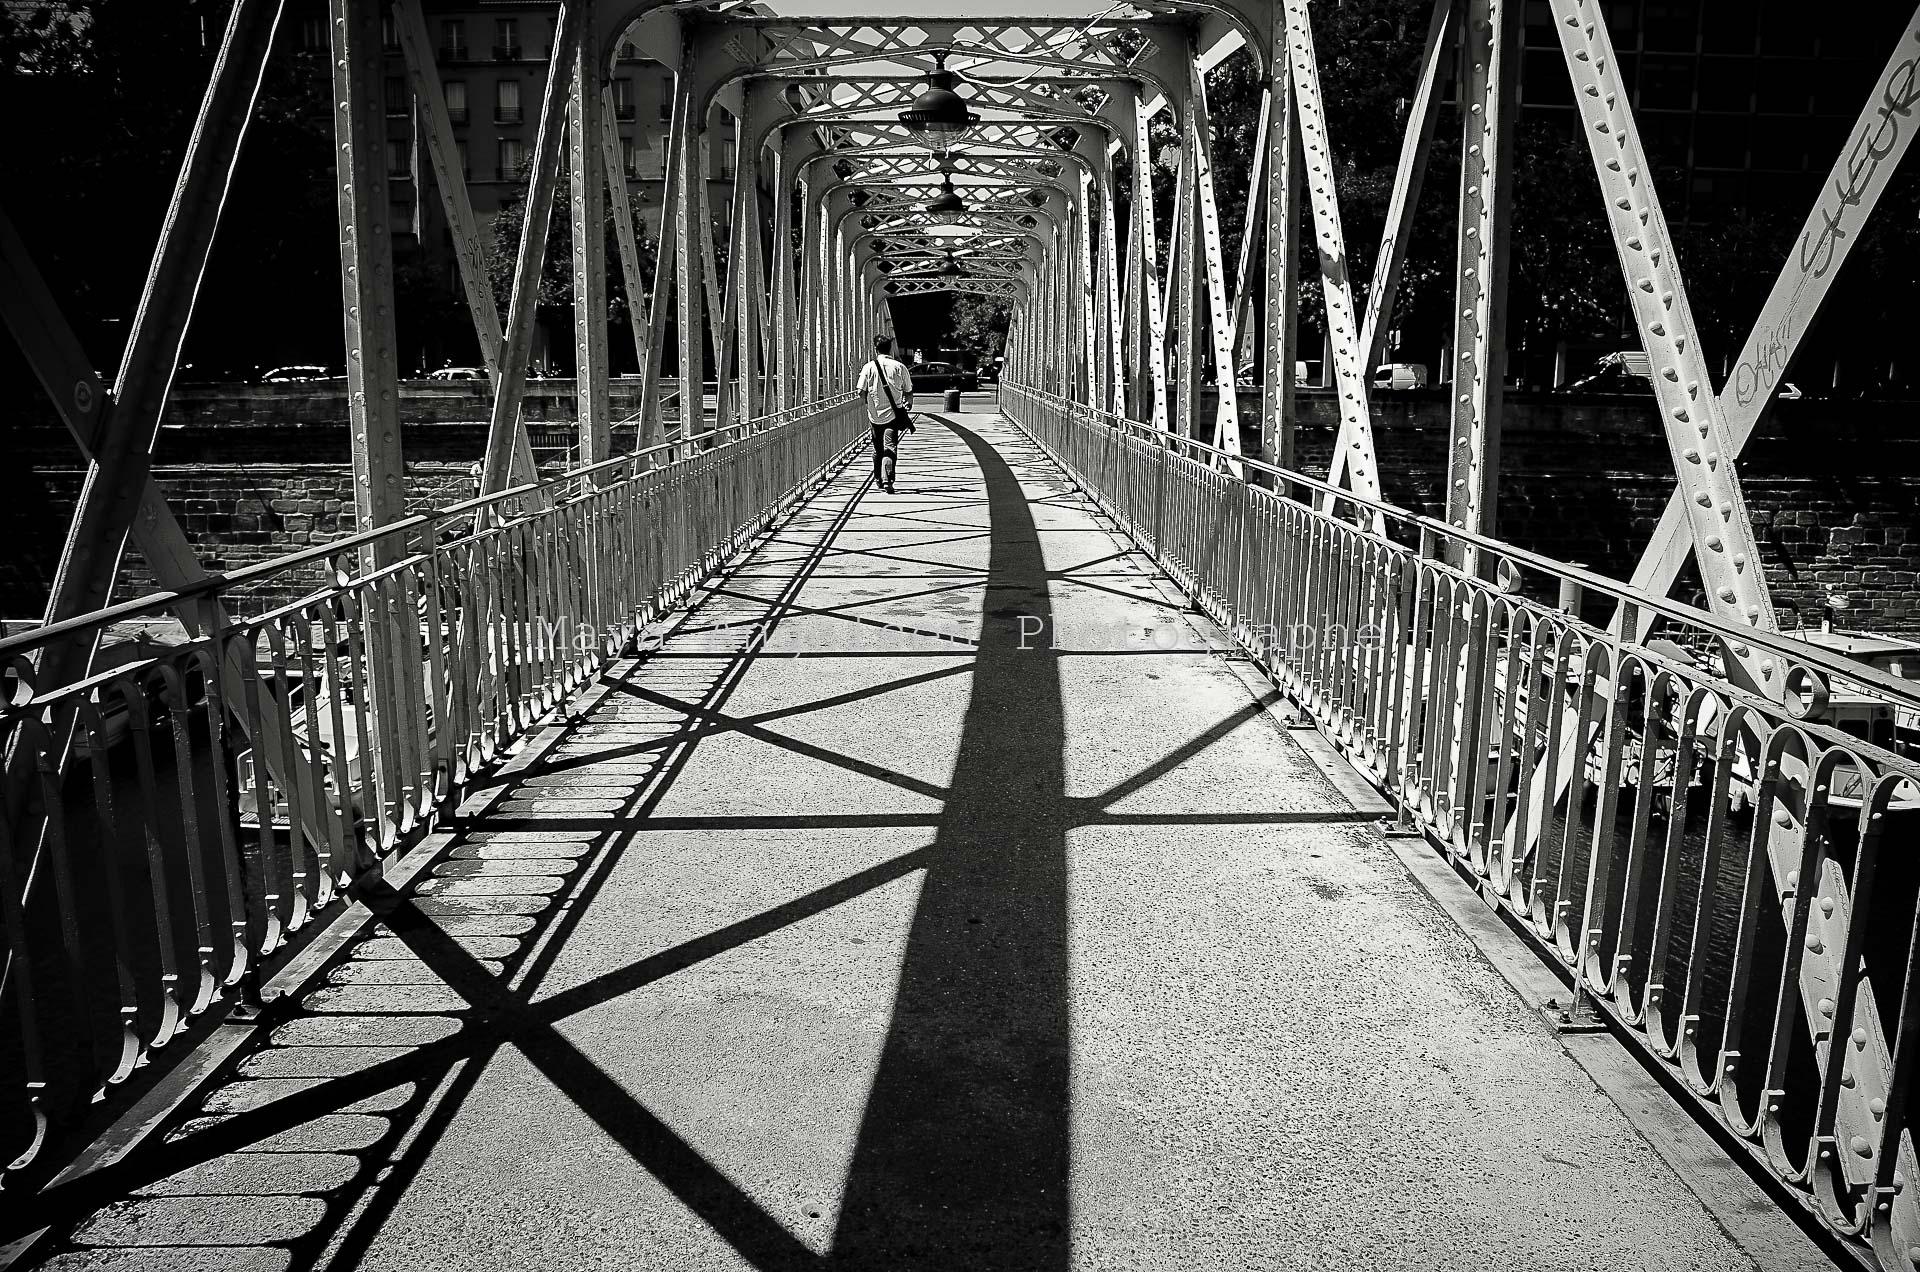 Photographe-streetphoto-maya-angelsen-le-monde-ATMOS'FER